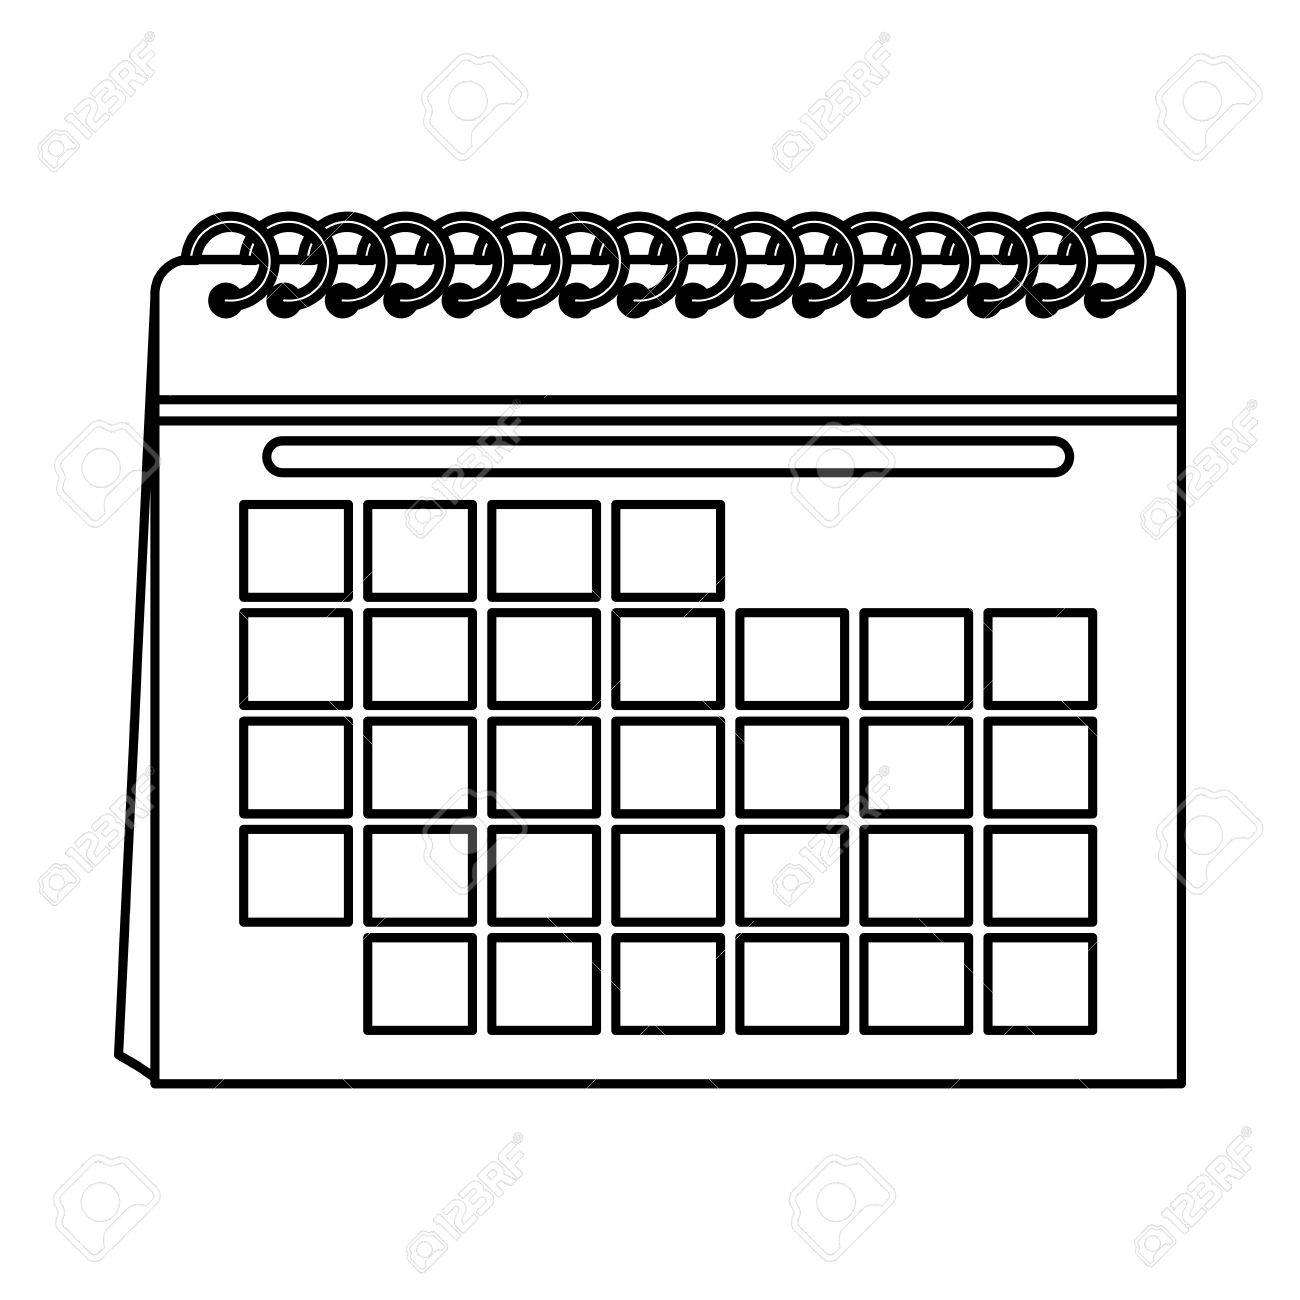 blank calendar icon image vector illustration design single...